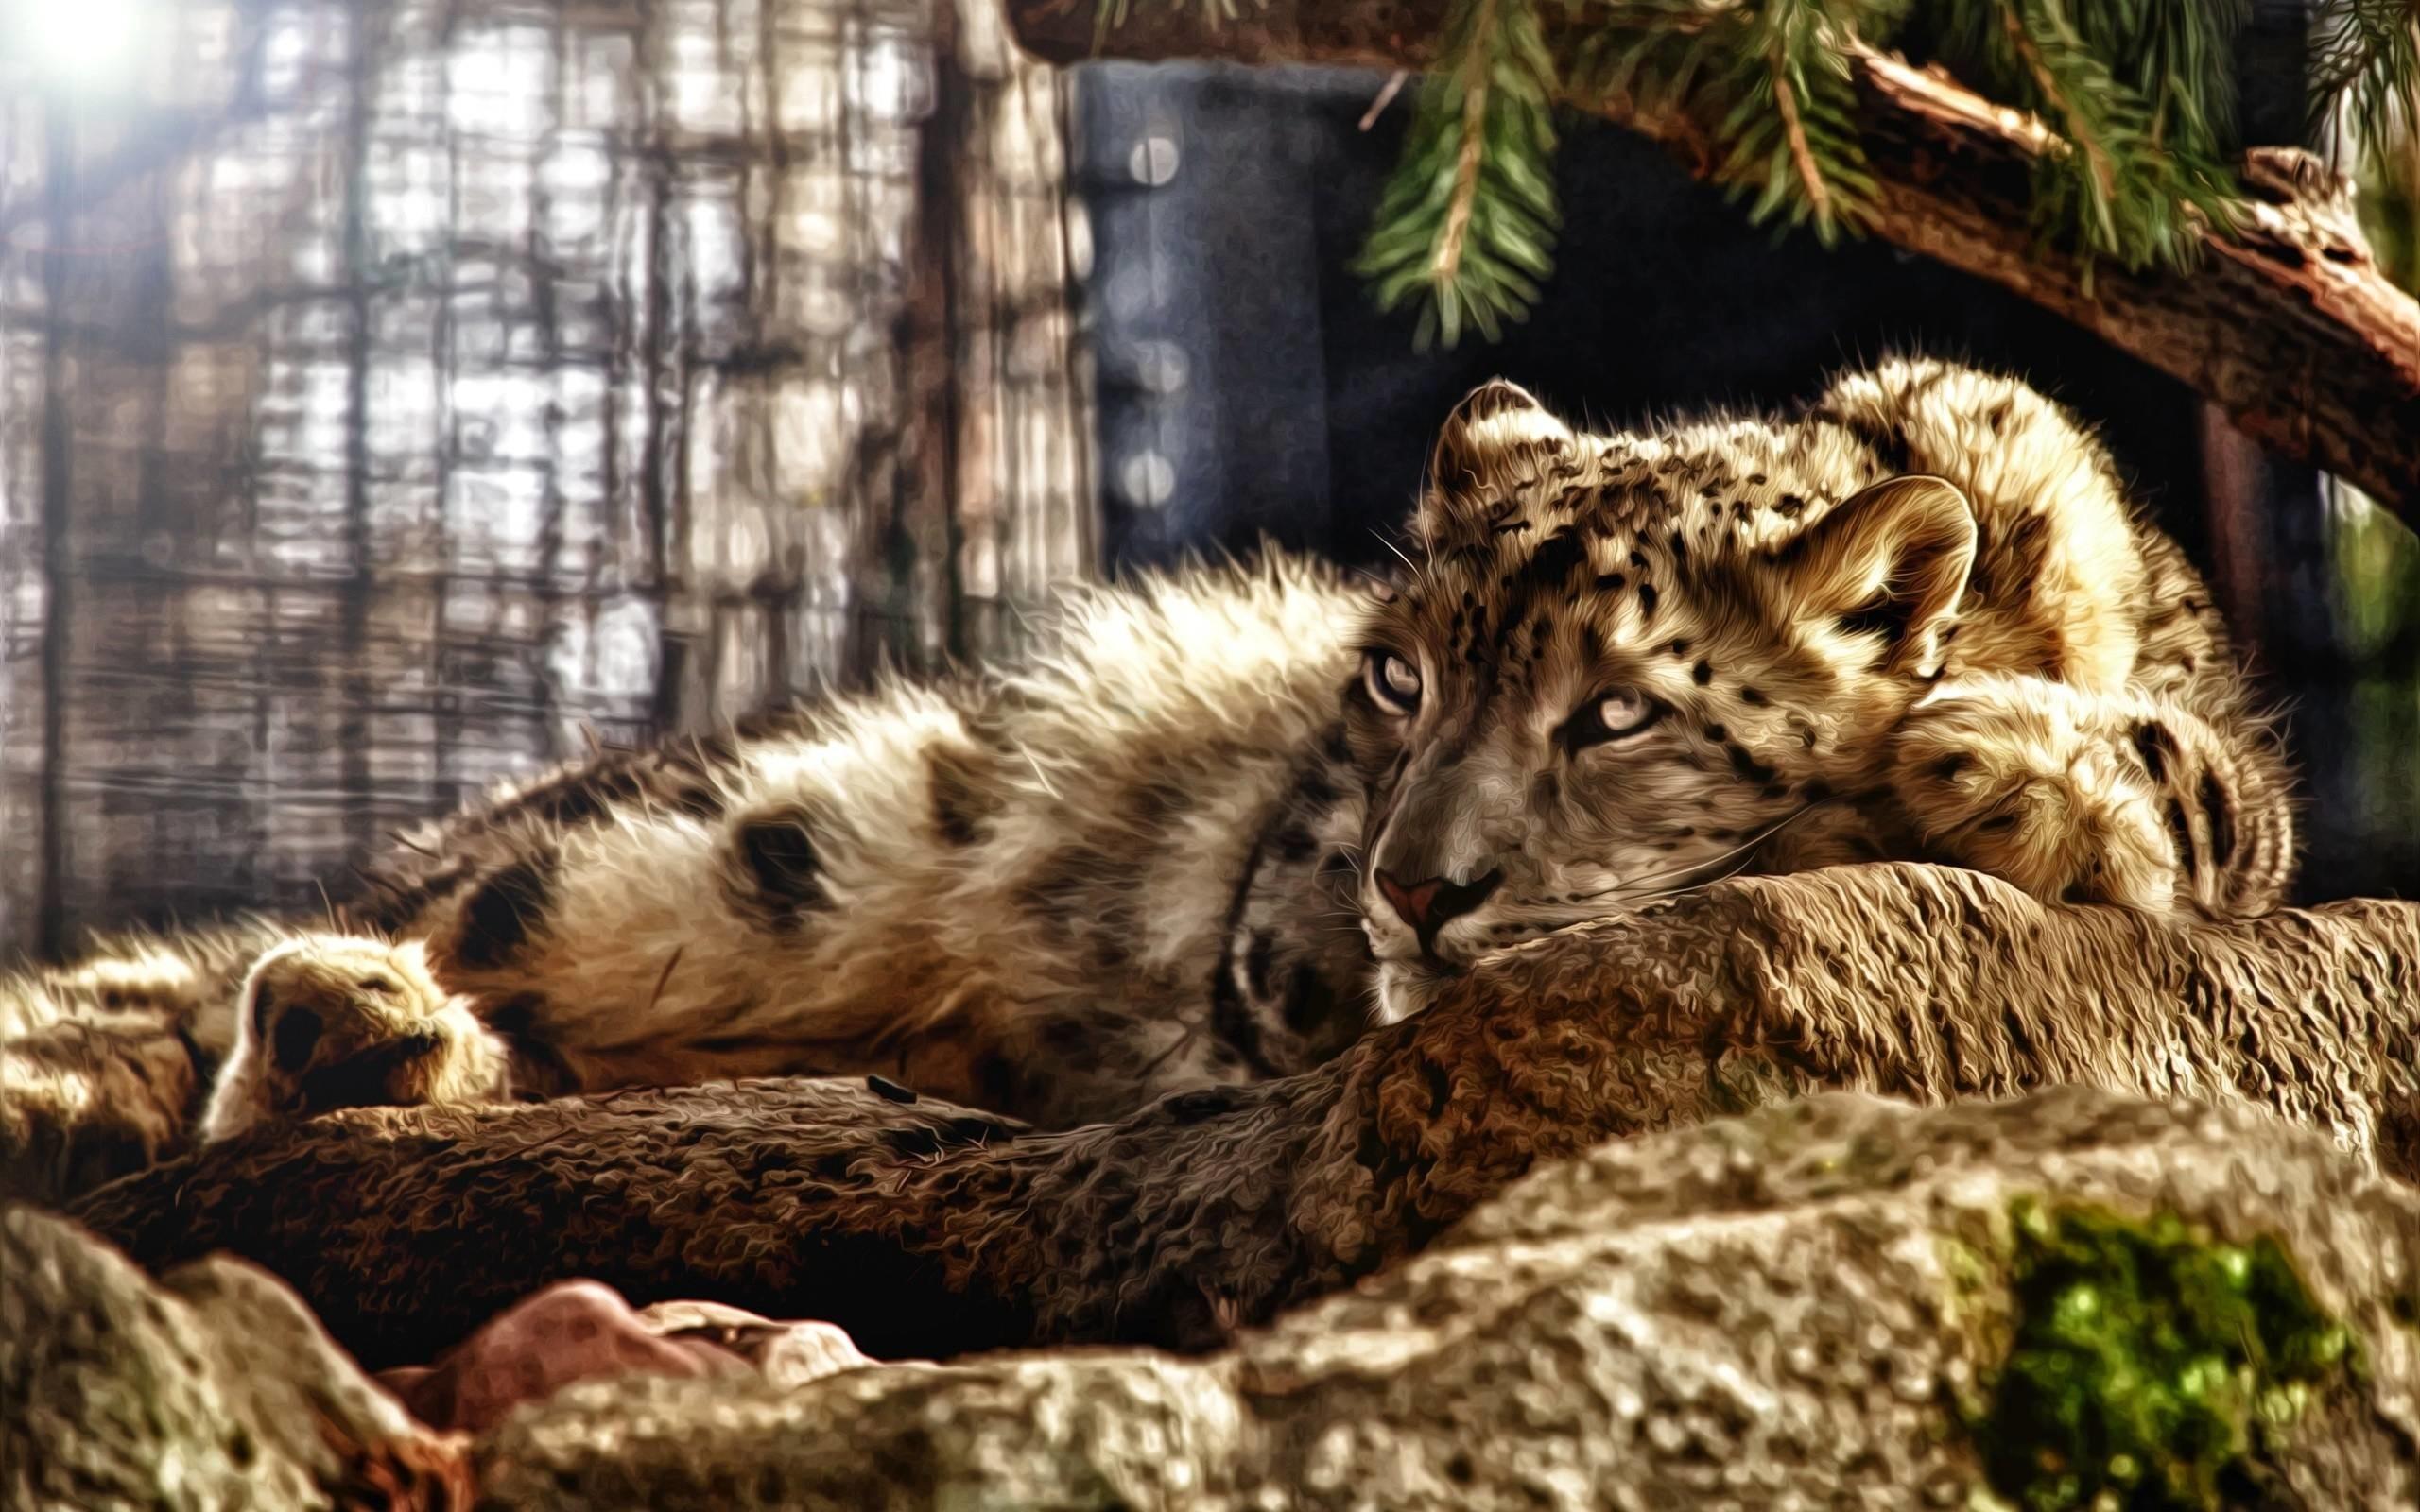 Cheetah Wallpaper Hd Wild Cat Wallpapers 183 ①